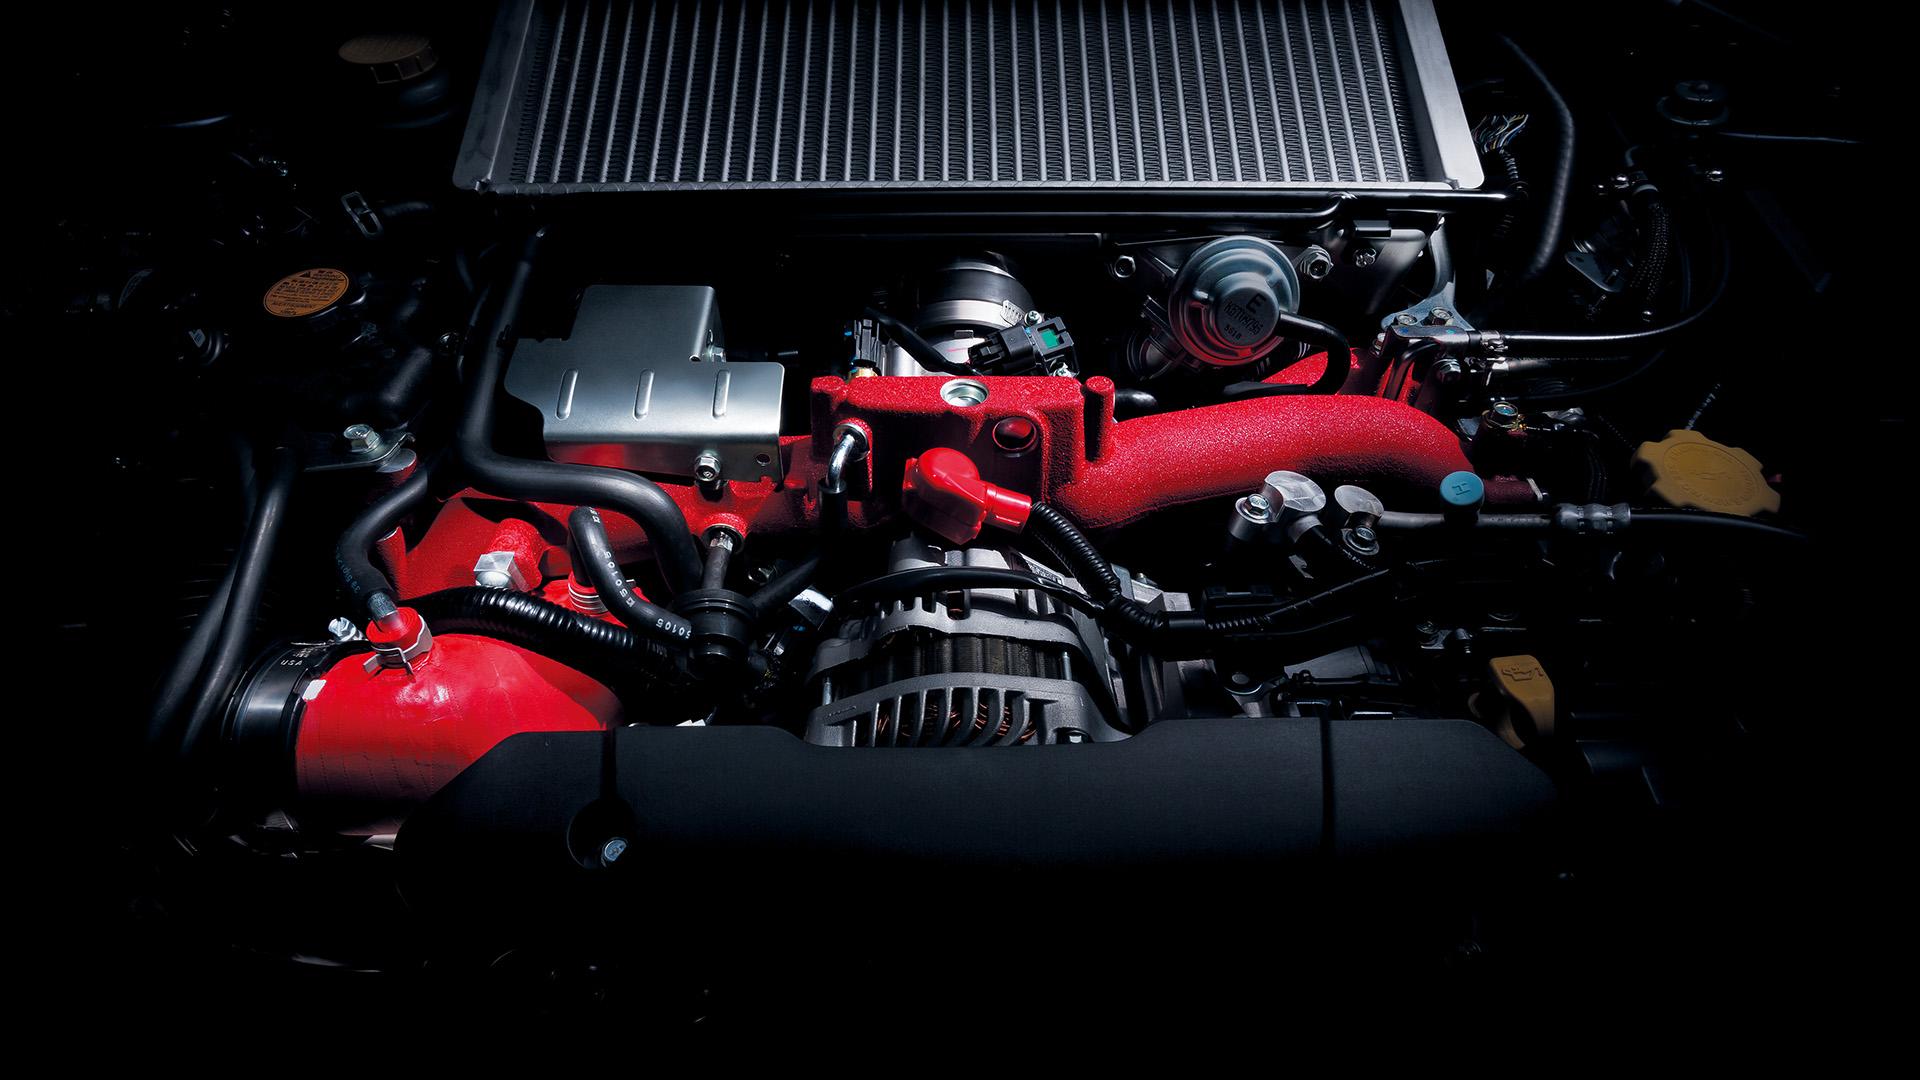 Subaru WRC STI - S207 - 2016 - moteur / engine